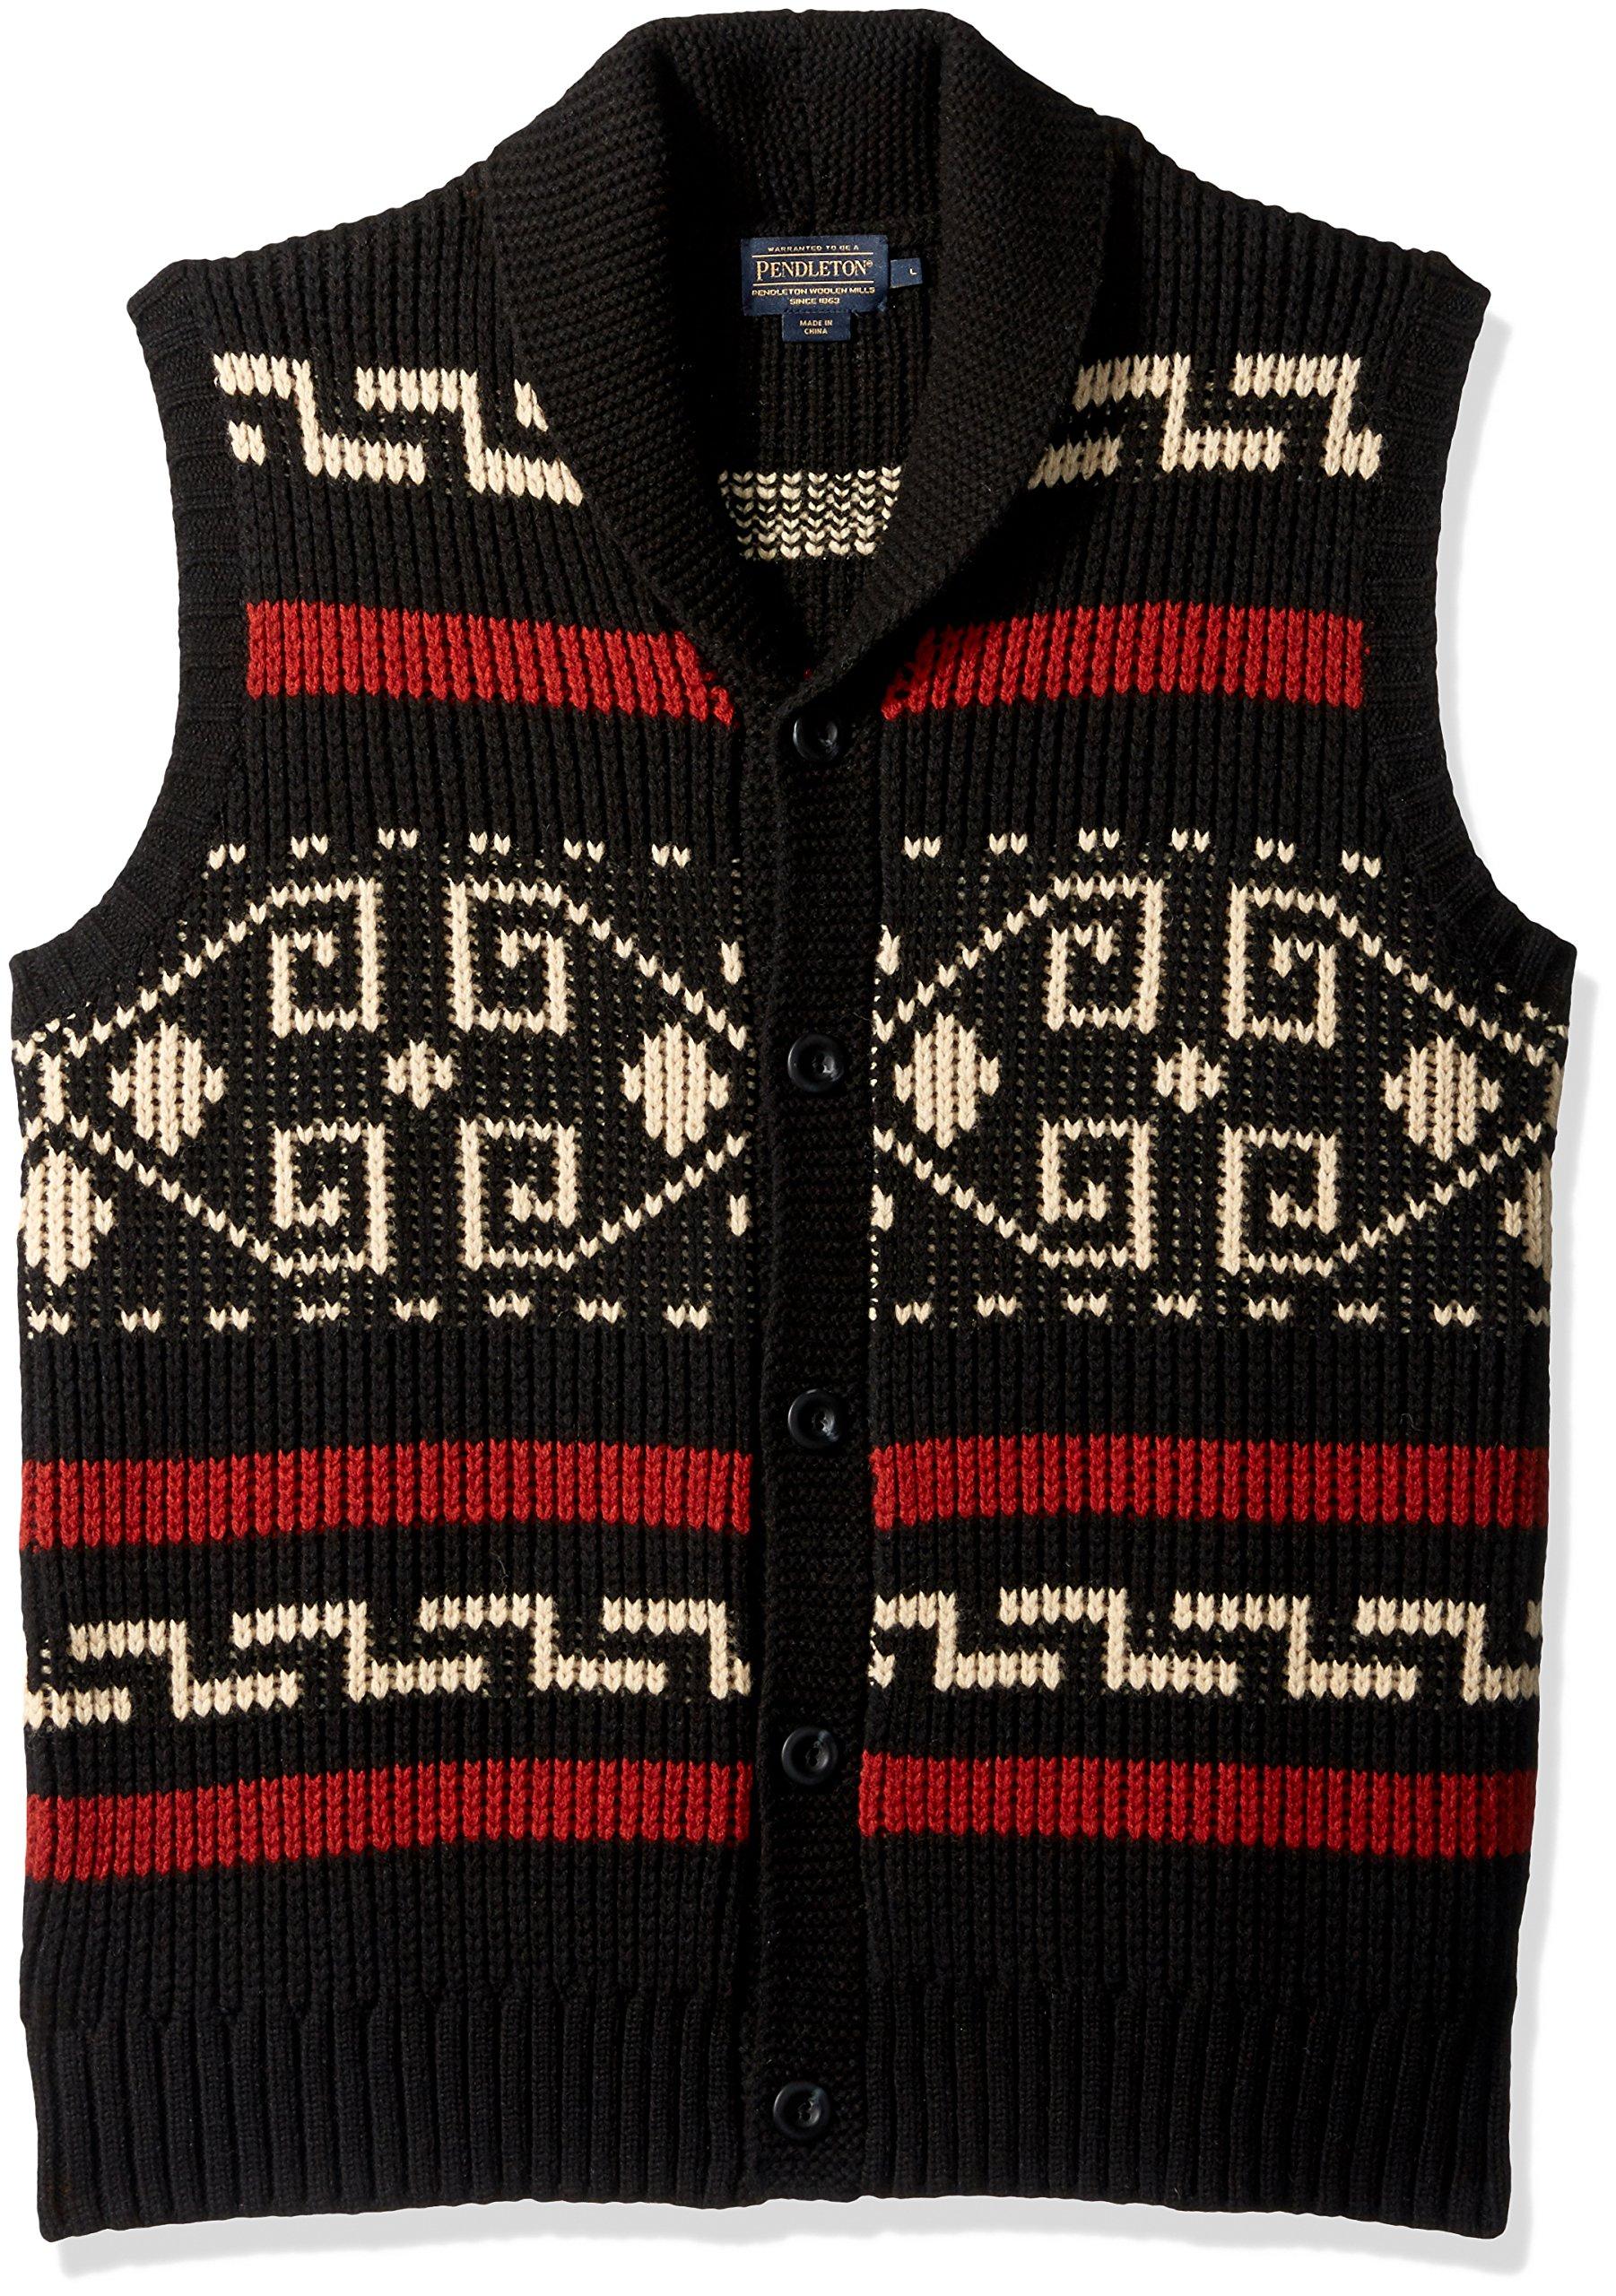 Pendleton Men's Westerley Sweater Vest, Black/Cream-61162, XS